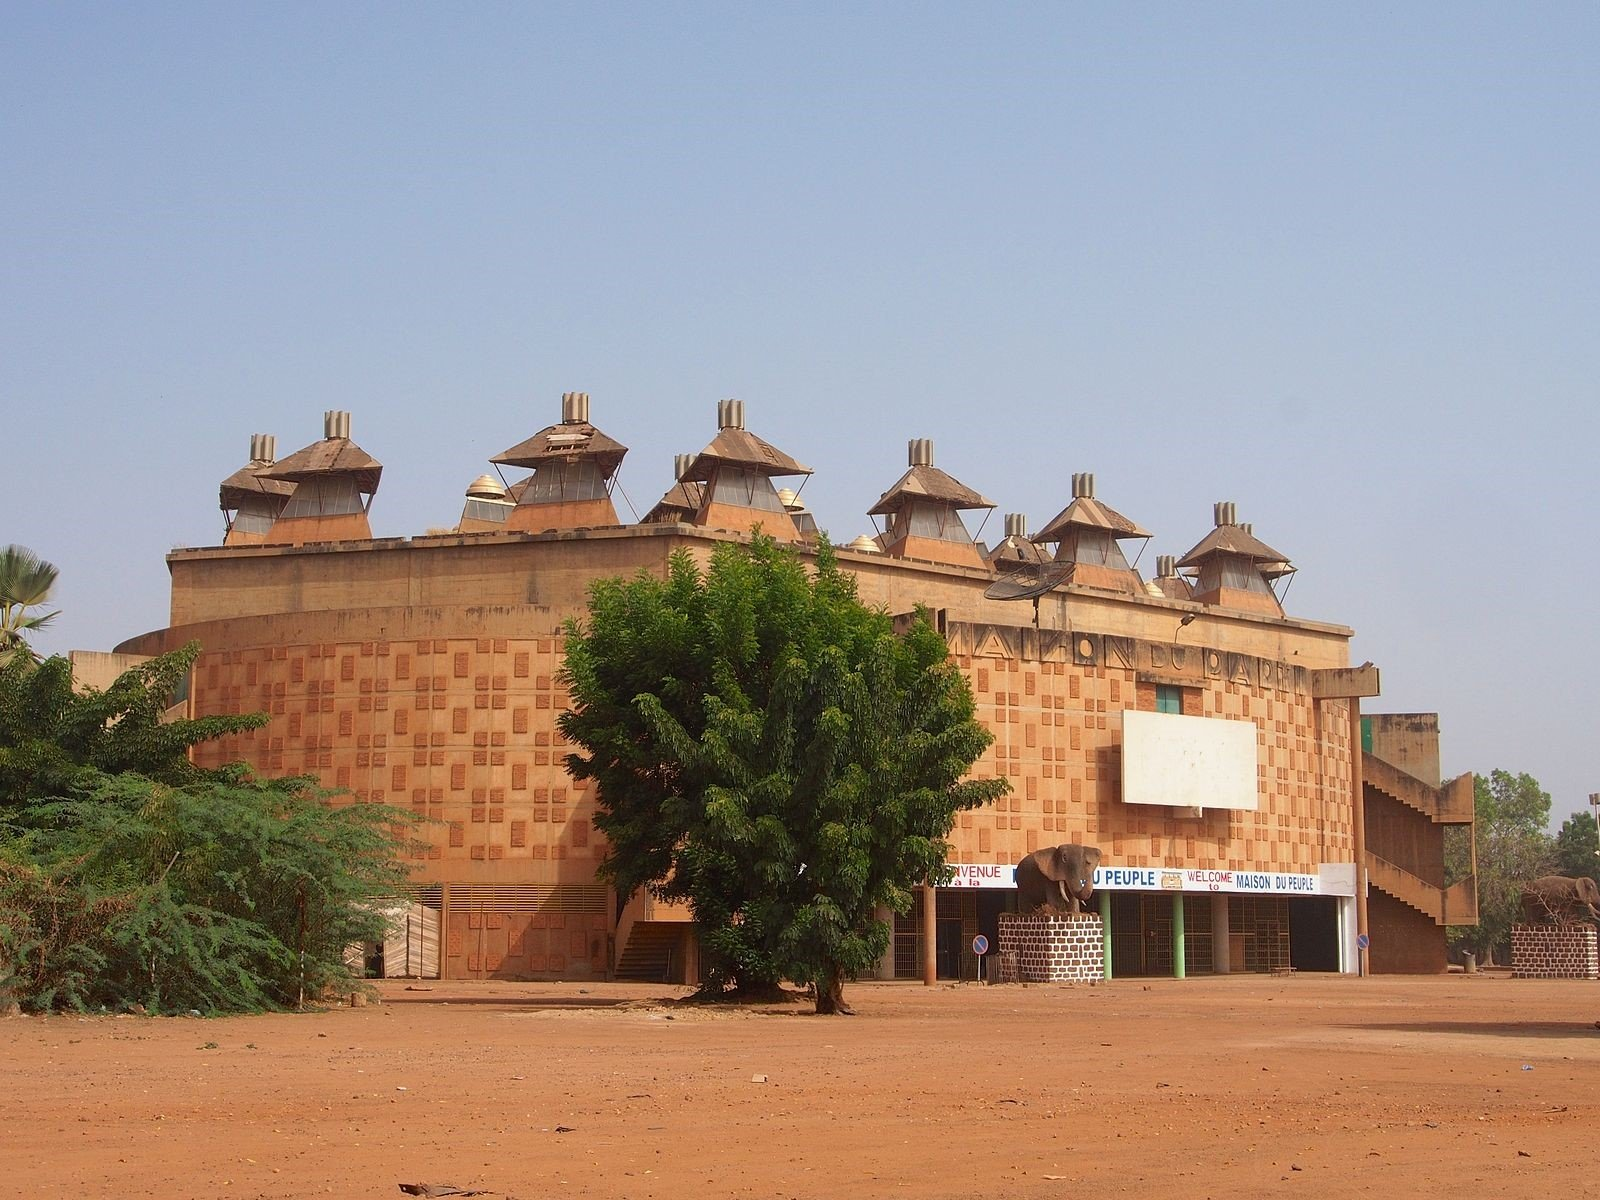 Ouagadougou tourism